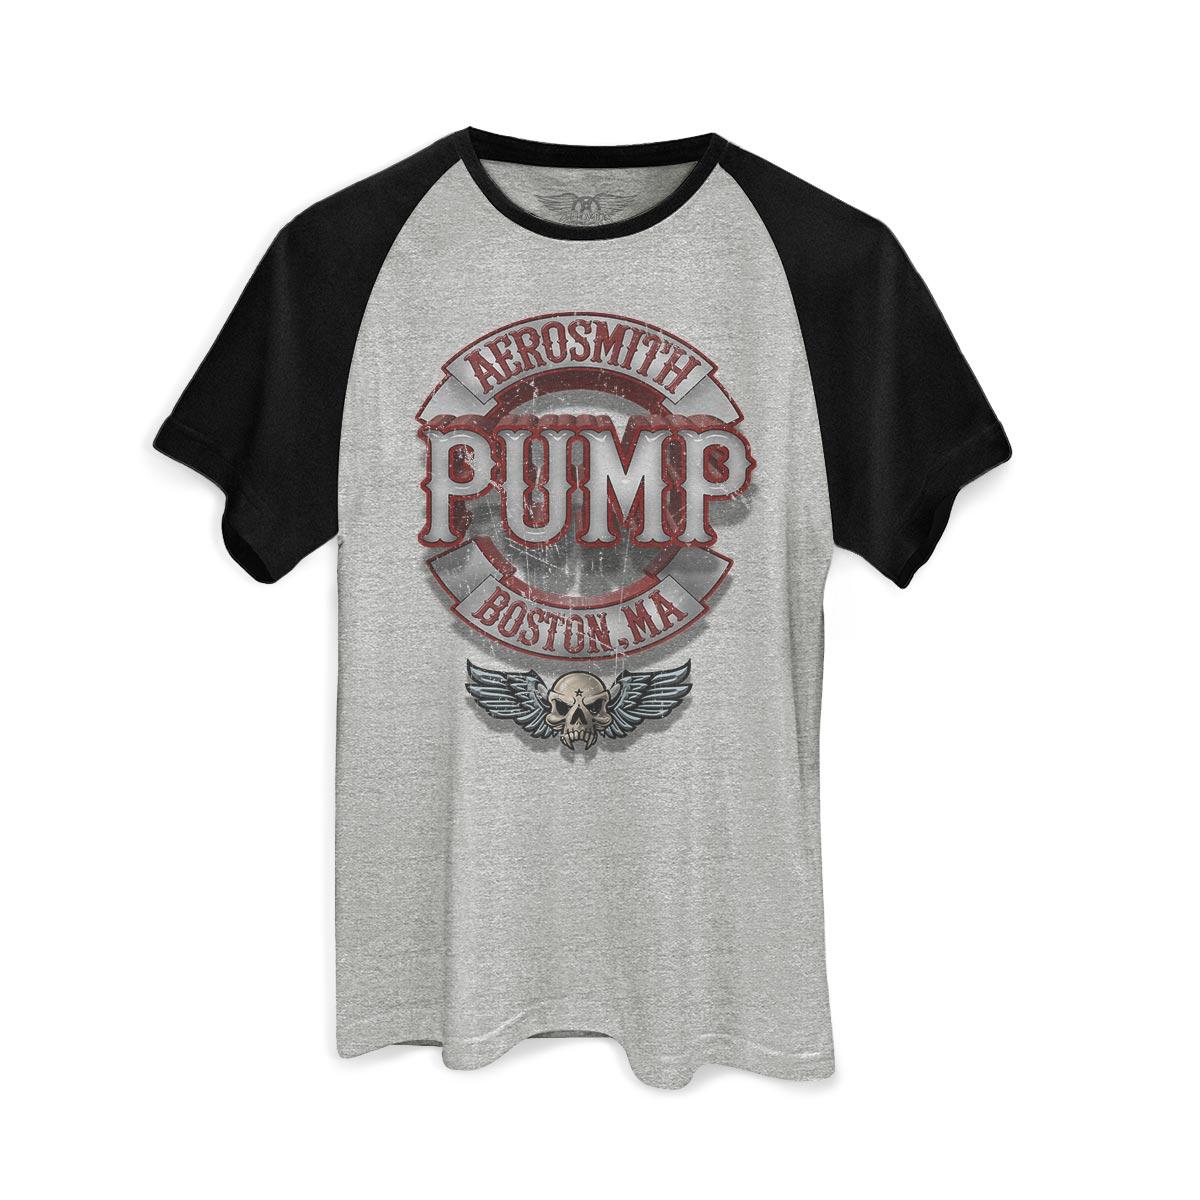 Camiseta Raglan Masculina Aerosmith Pump